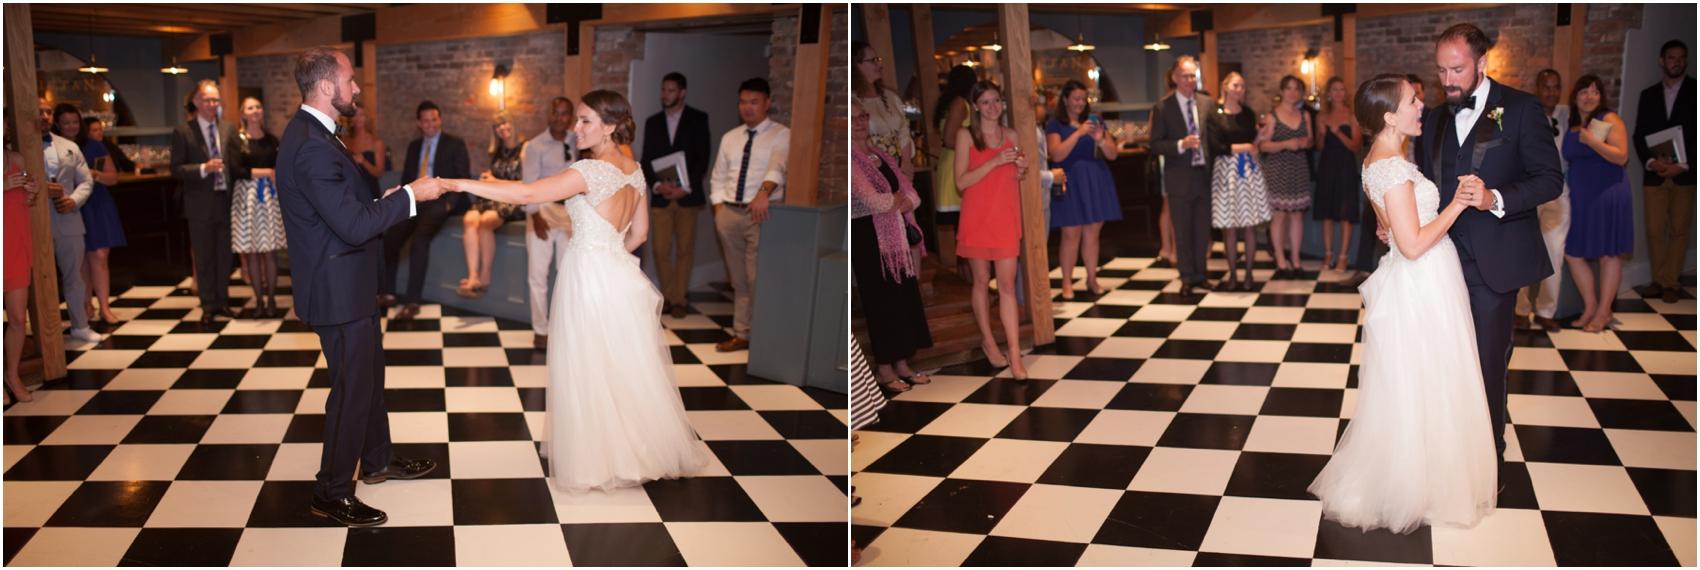 Old-Metropolitan-Hall-Wedding-Charlottesville-Virginia-2-6.jpg